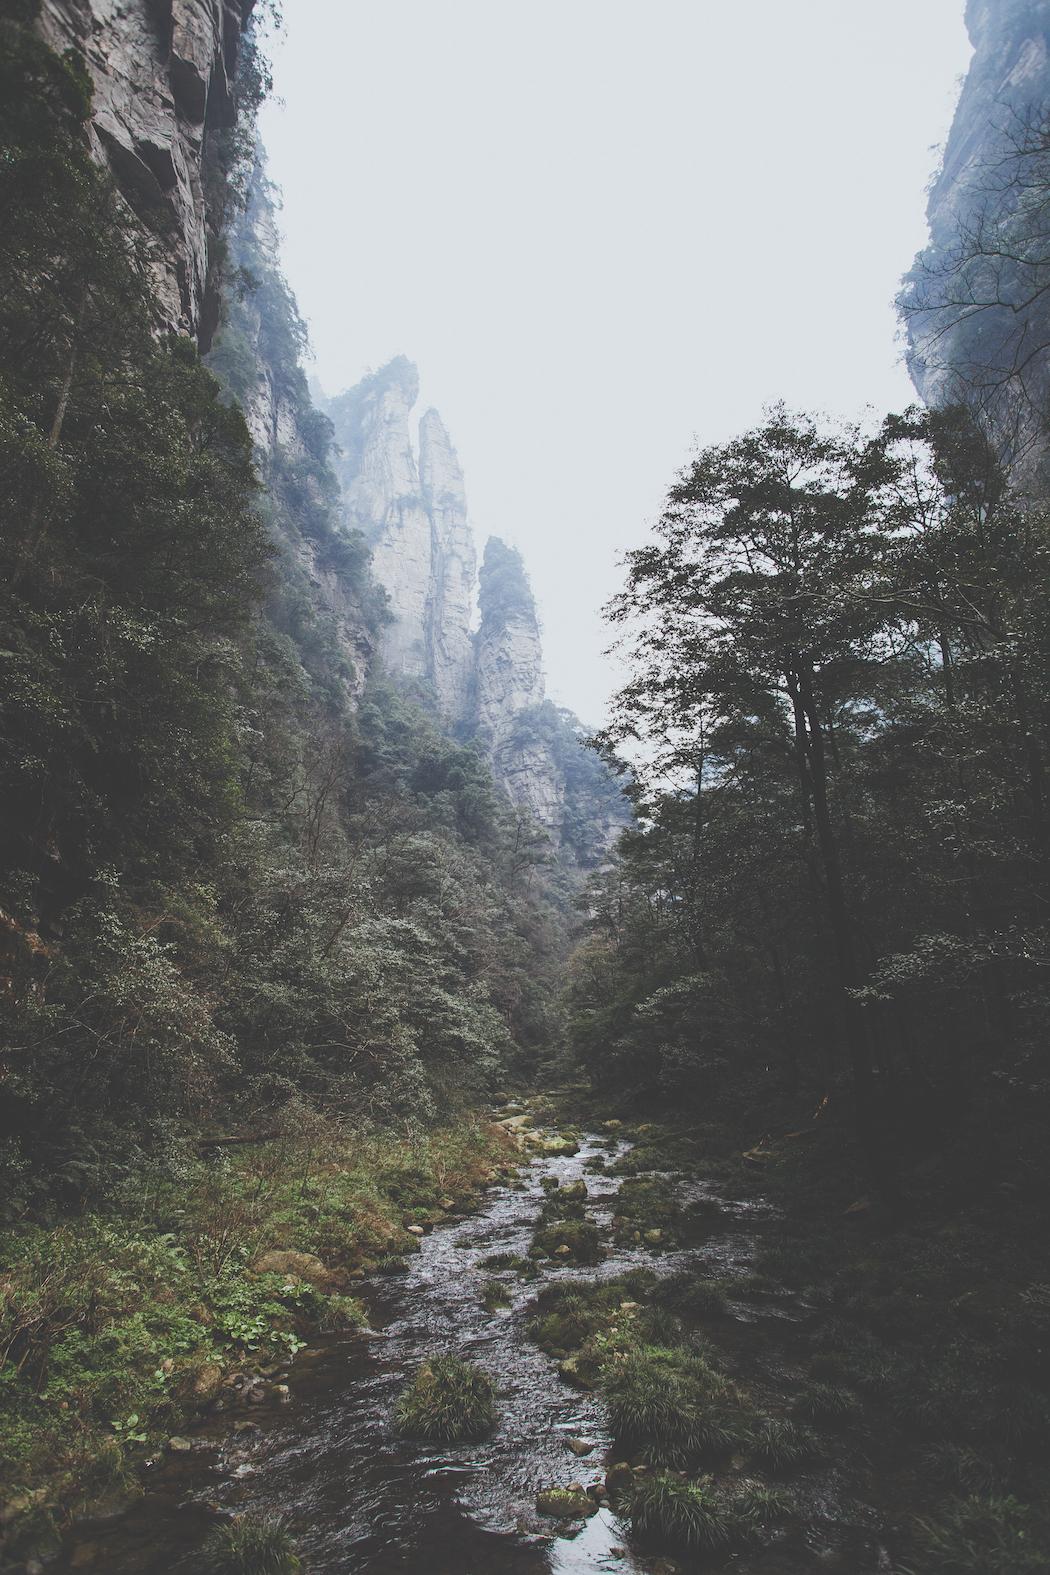 lukegram_ontheroad-61